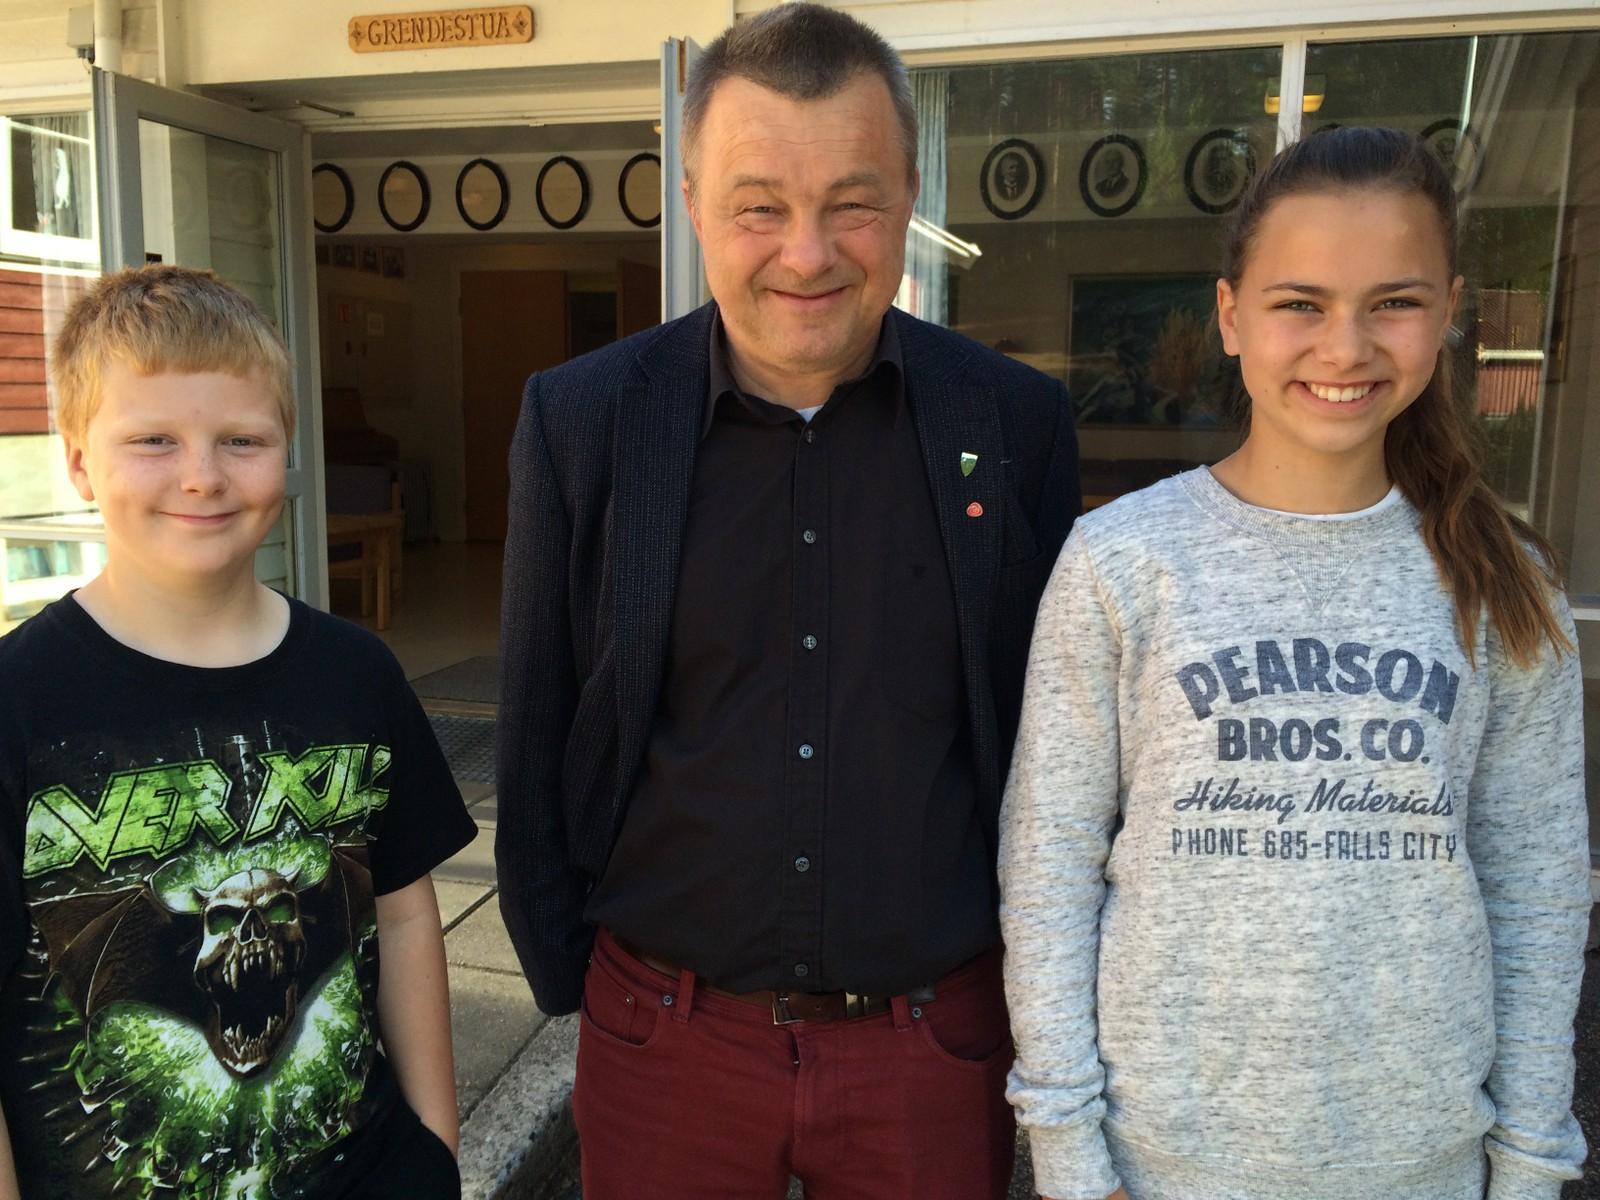 Adrian Aamlid Madsen (5. klasse), ordfører i Birkenes Anders Christiansen og Nathalie Vehusheia(7. klasse).